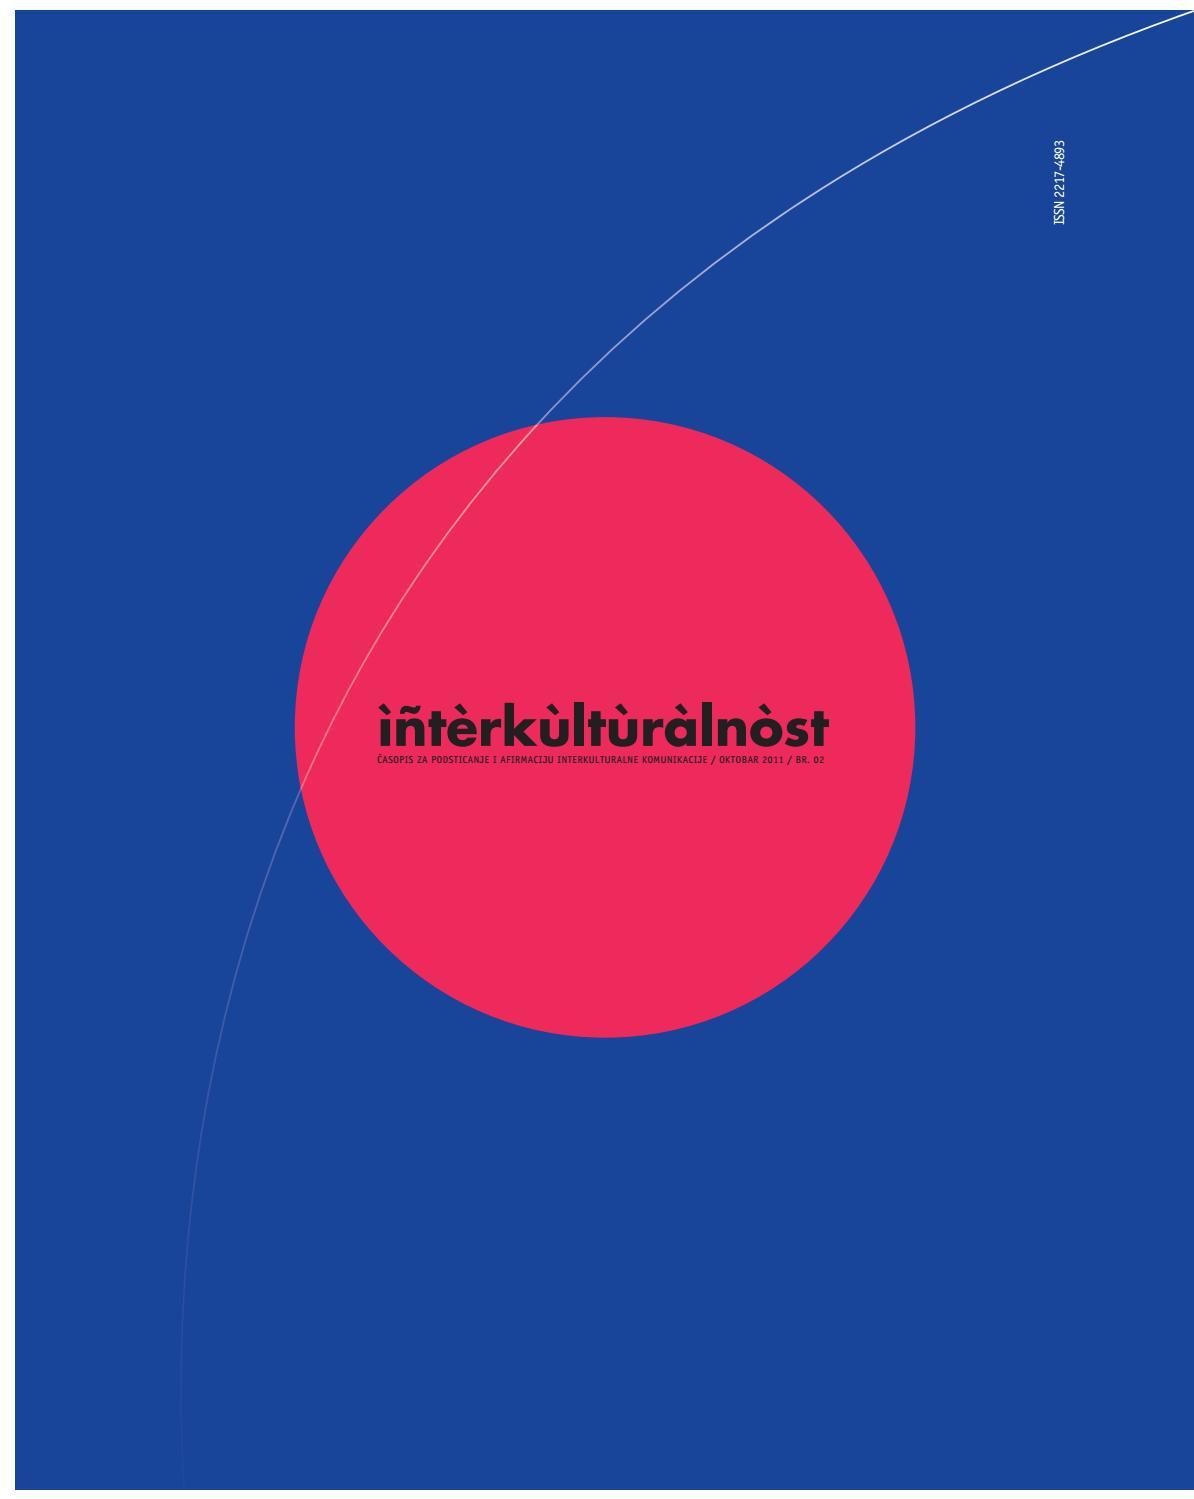 Interkulturalnost Br 2 By Zavod Za Kulturu Vojvodine Issuu